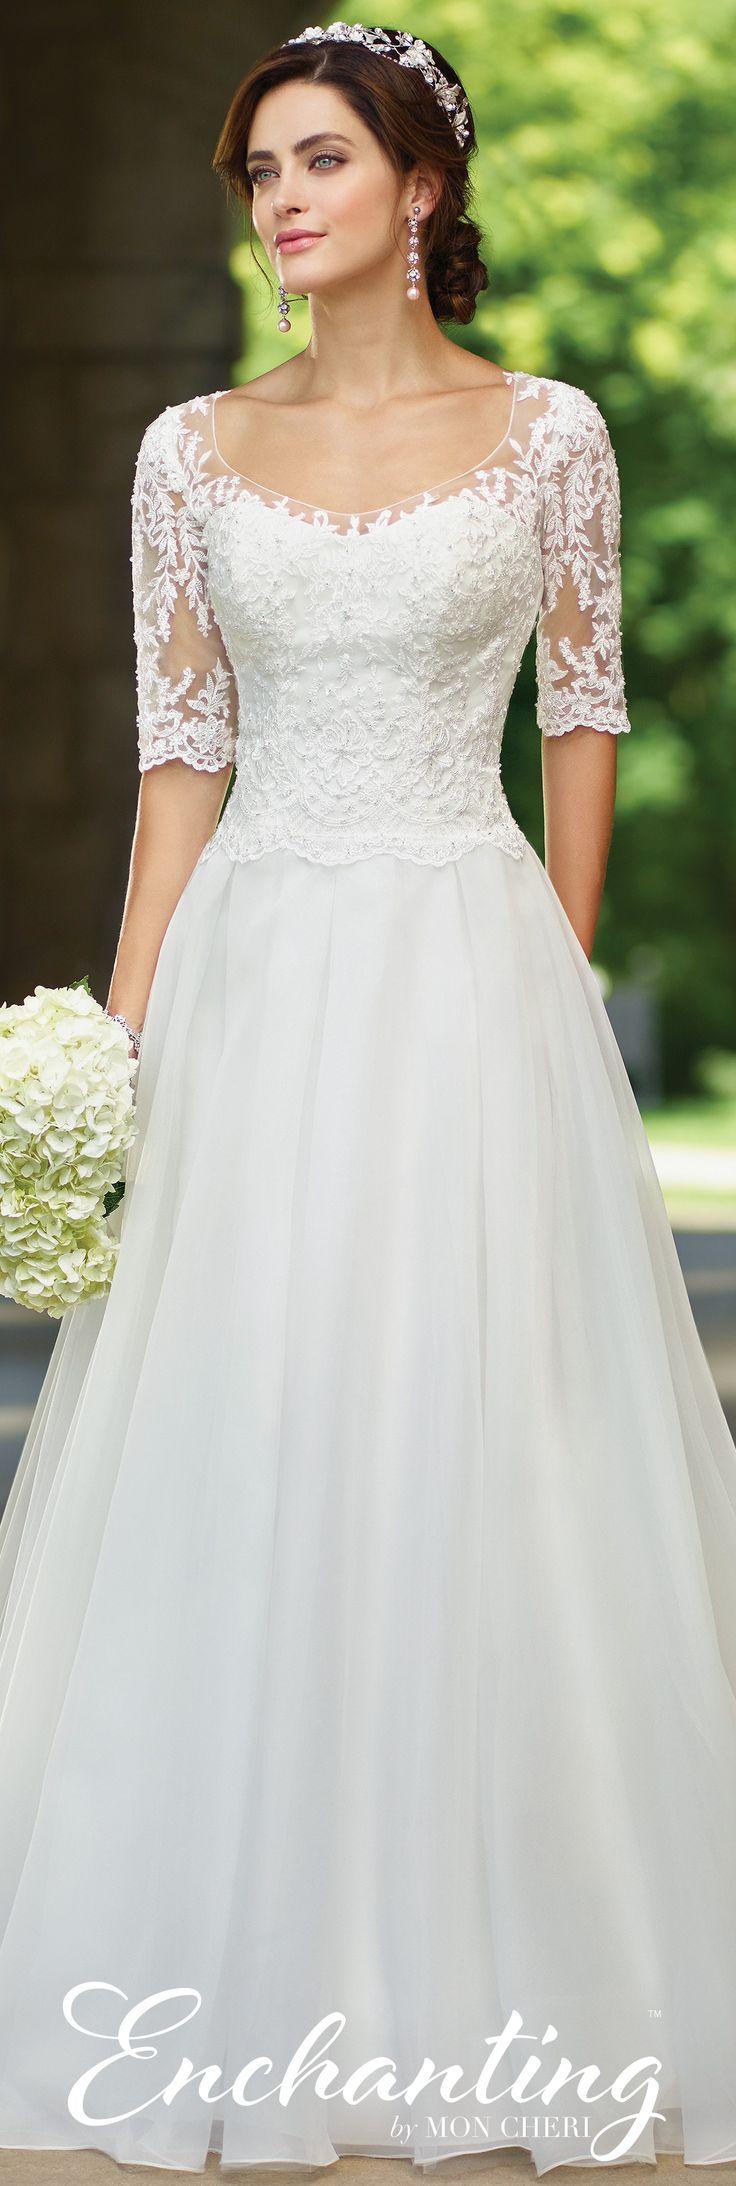 Organza A Line Wedding Dress 117177 Enchanting By Mon Cheri